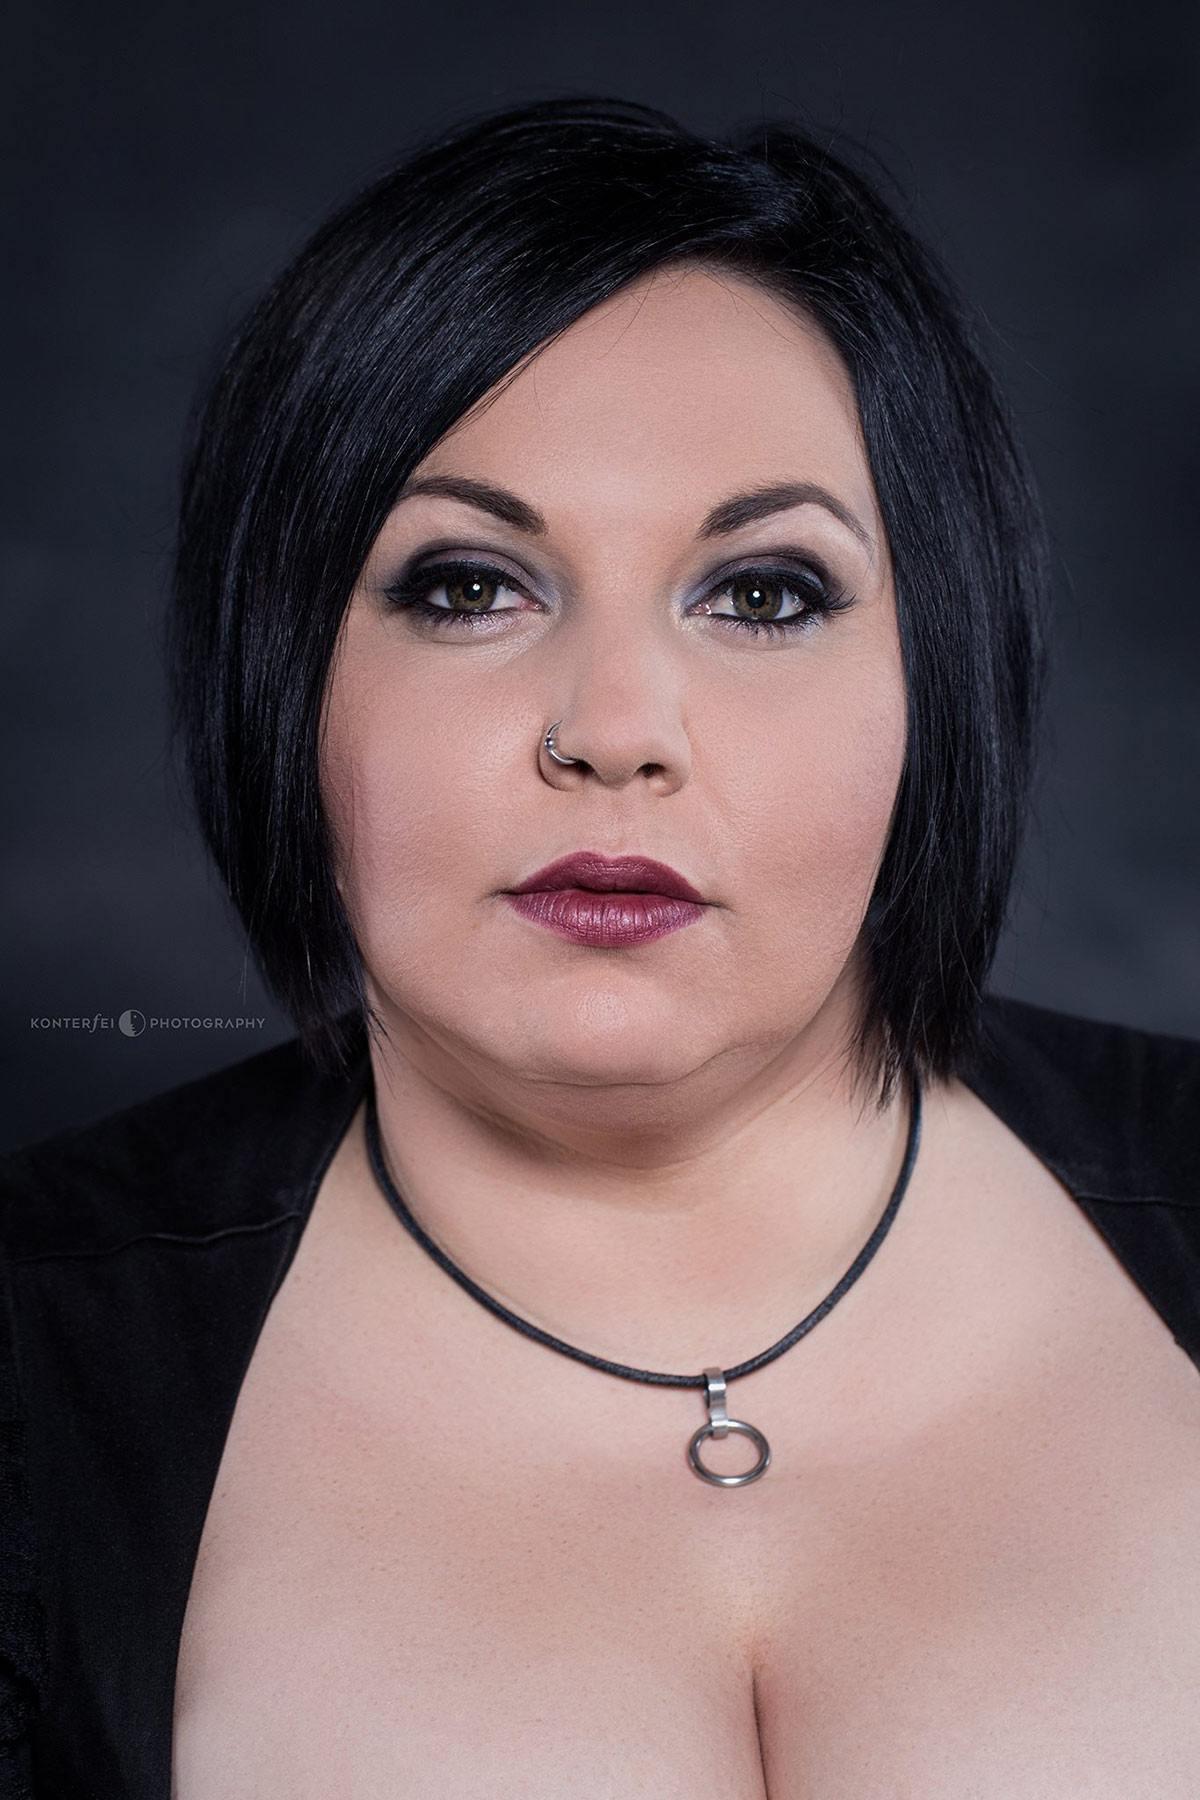 Miss Darko | Beauty Portraits | Photography